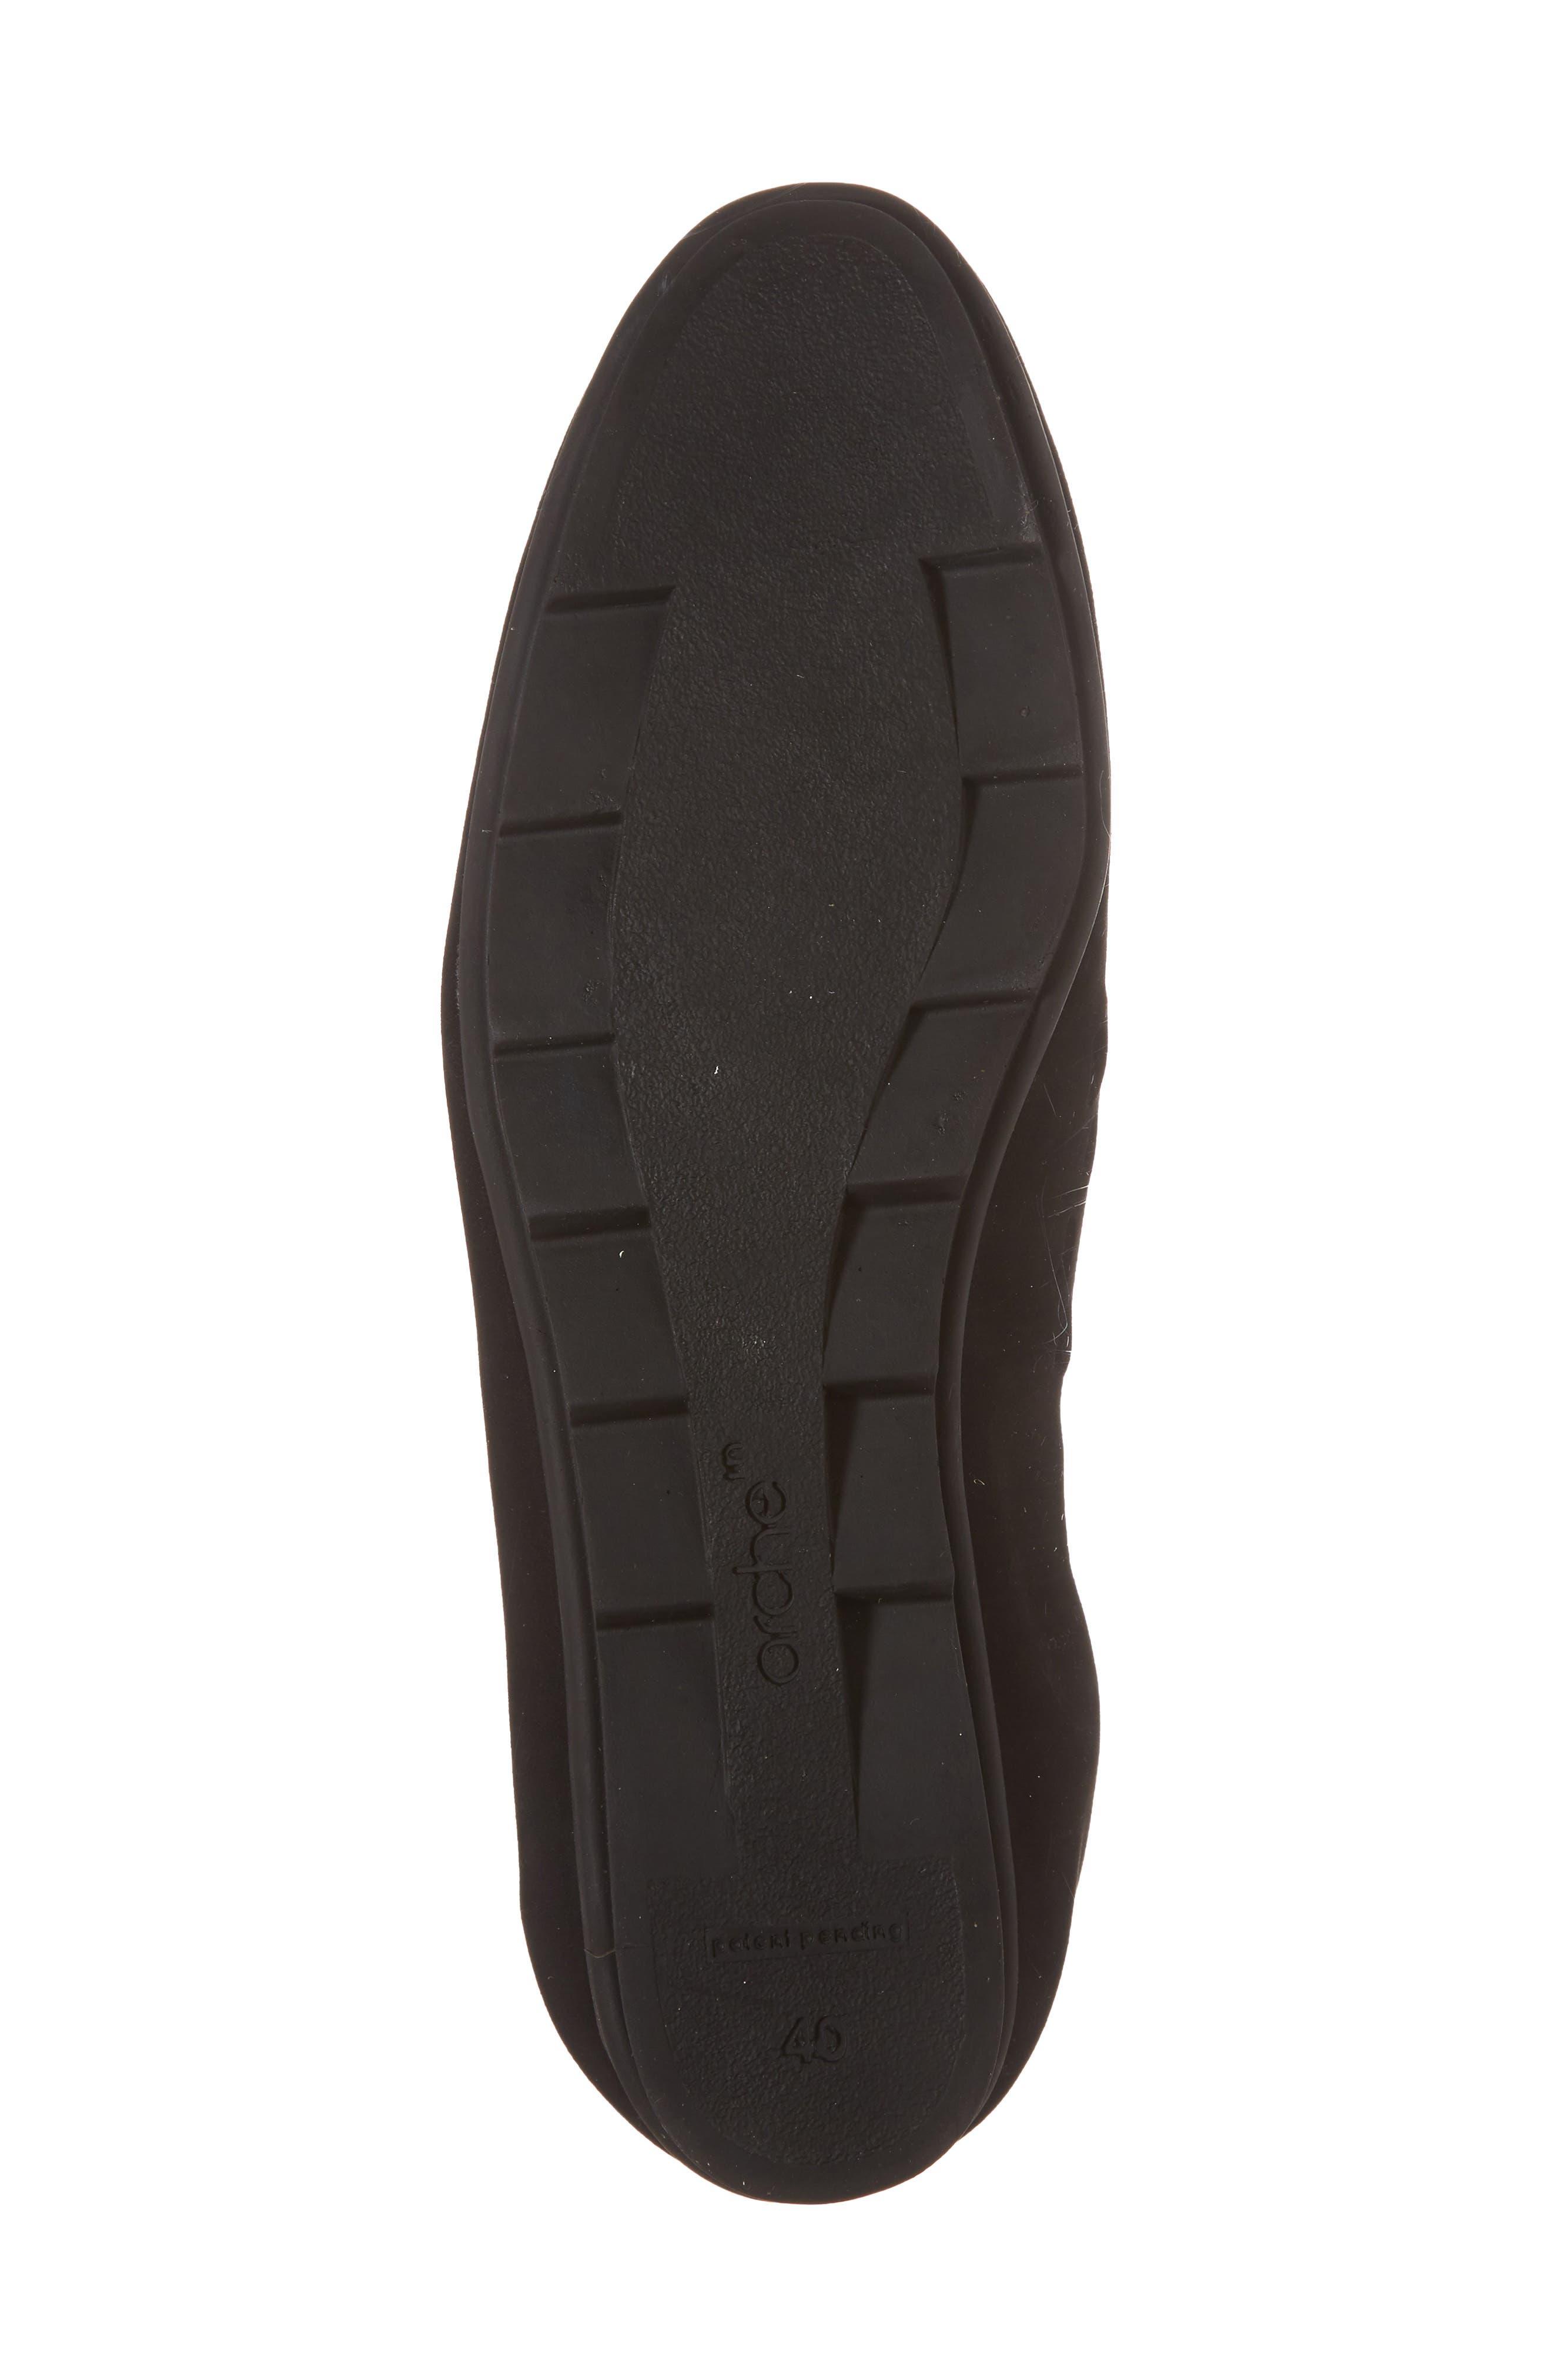 Bibiza Flat,                             Alternate thumbnail 6, color,                             Noir Nubuck Leather